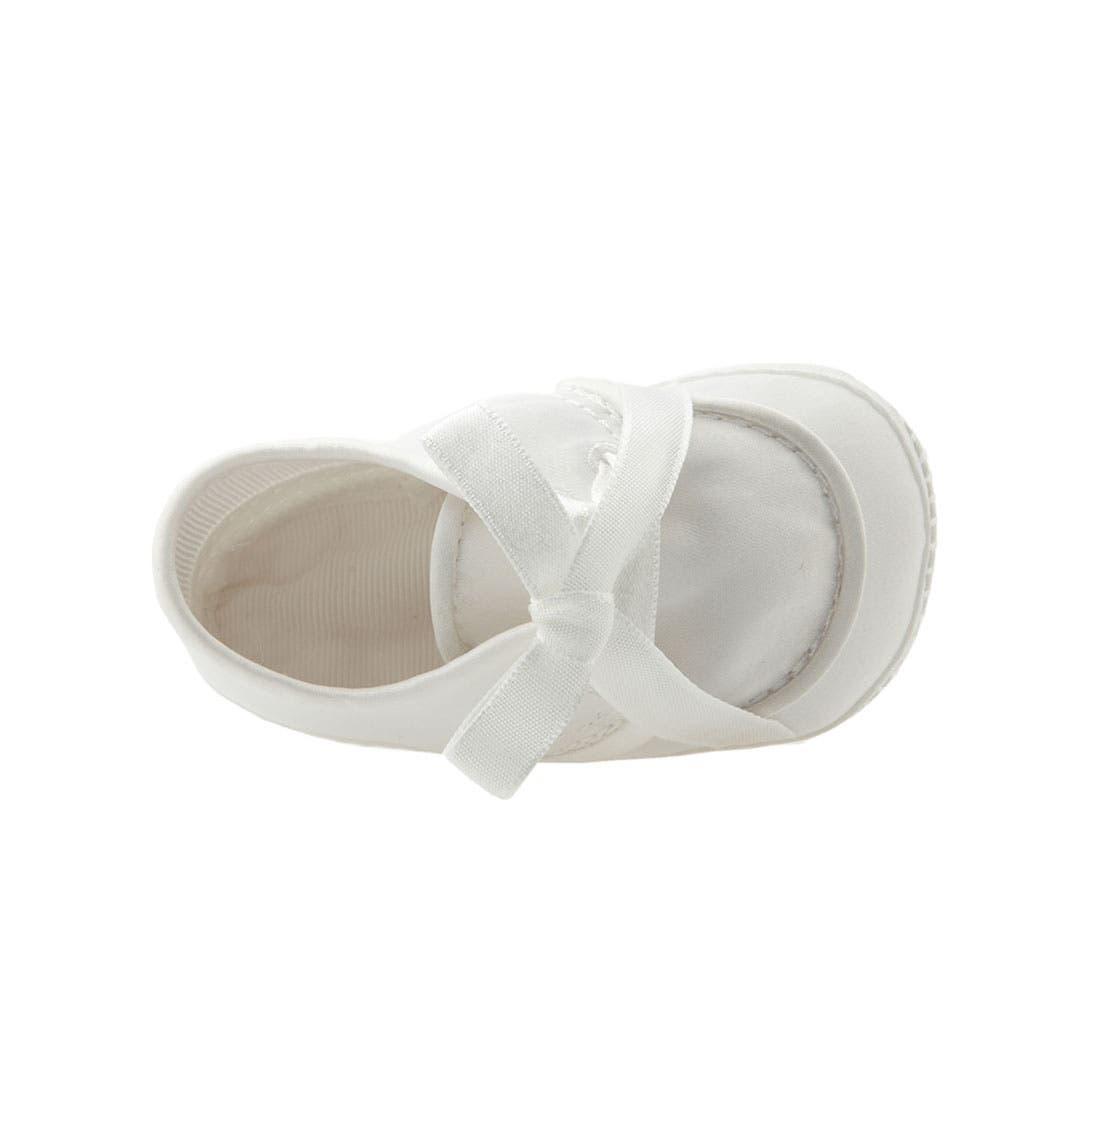 Alternate Image 3  - Designer's Touch 'Michael' Crib Shoe (Baby)